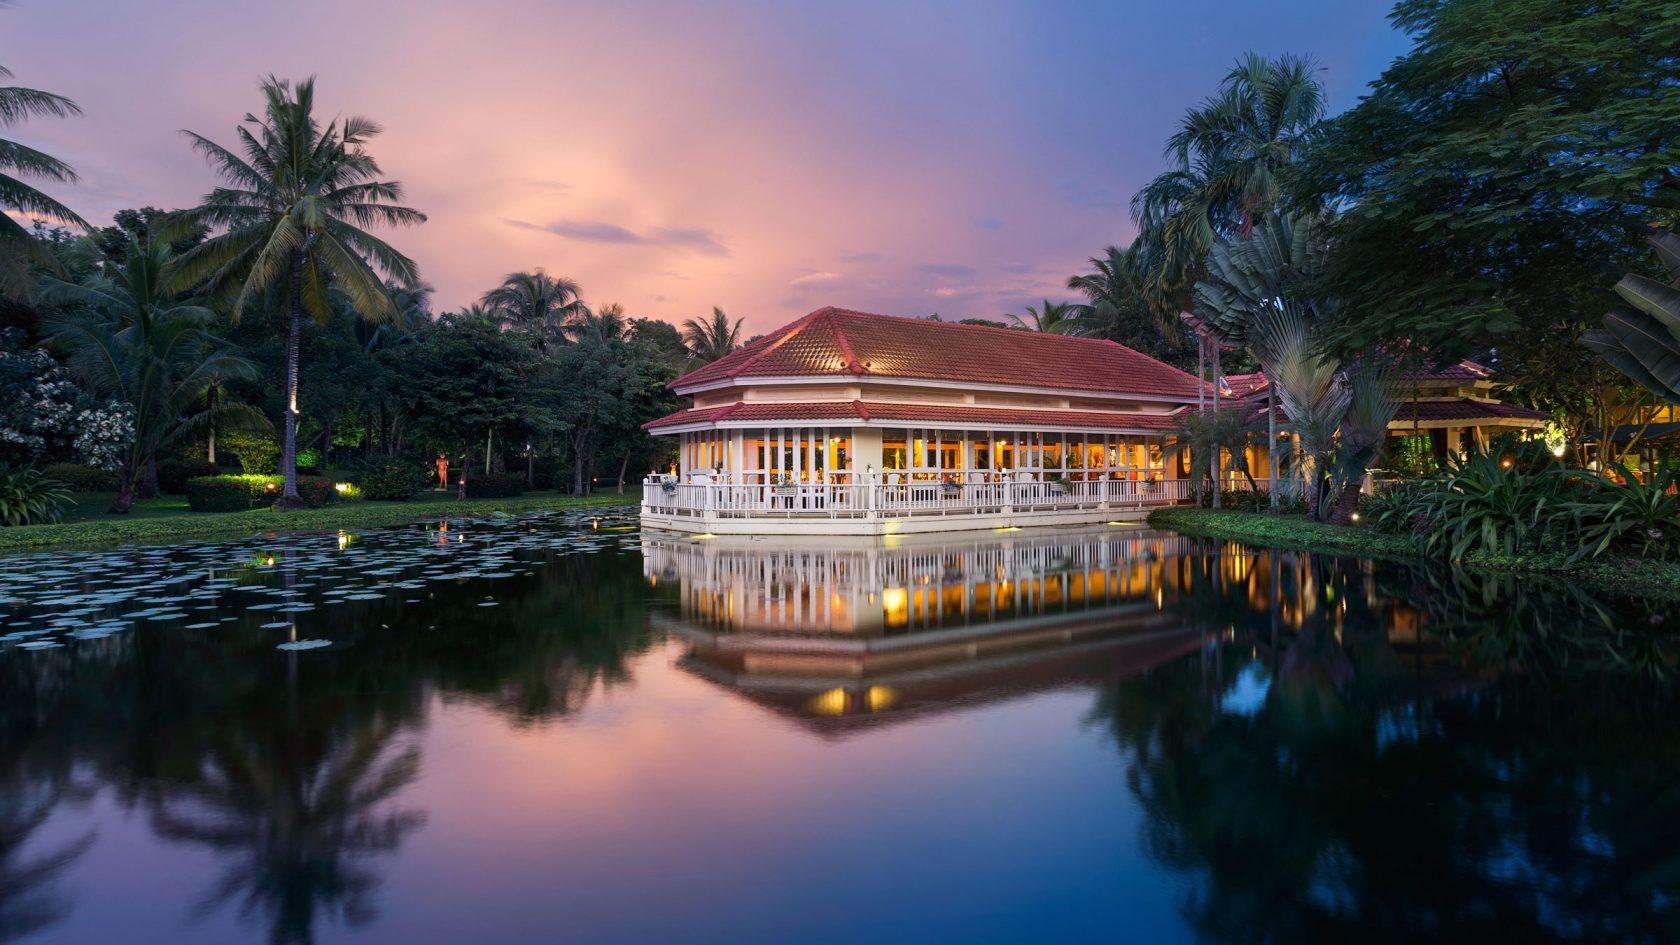 Sofitel Angkor Phokeethra Golf and Spa Resort, Siem Reap / Kambodscha